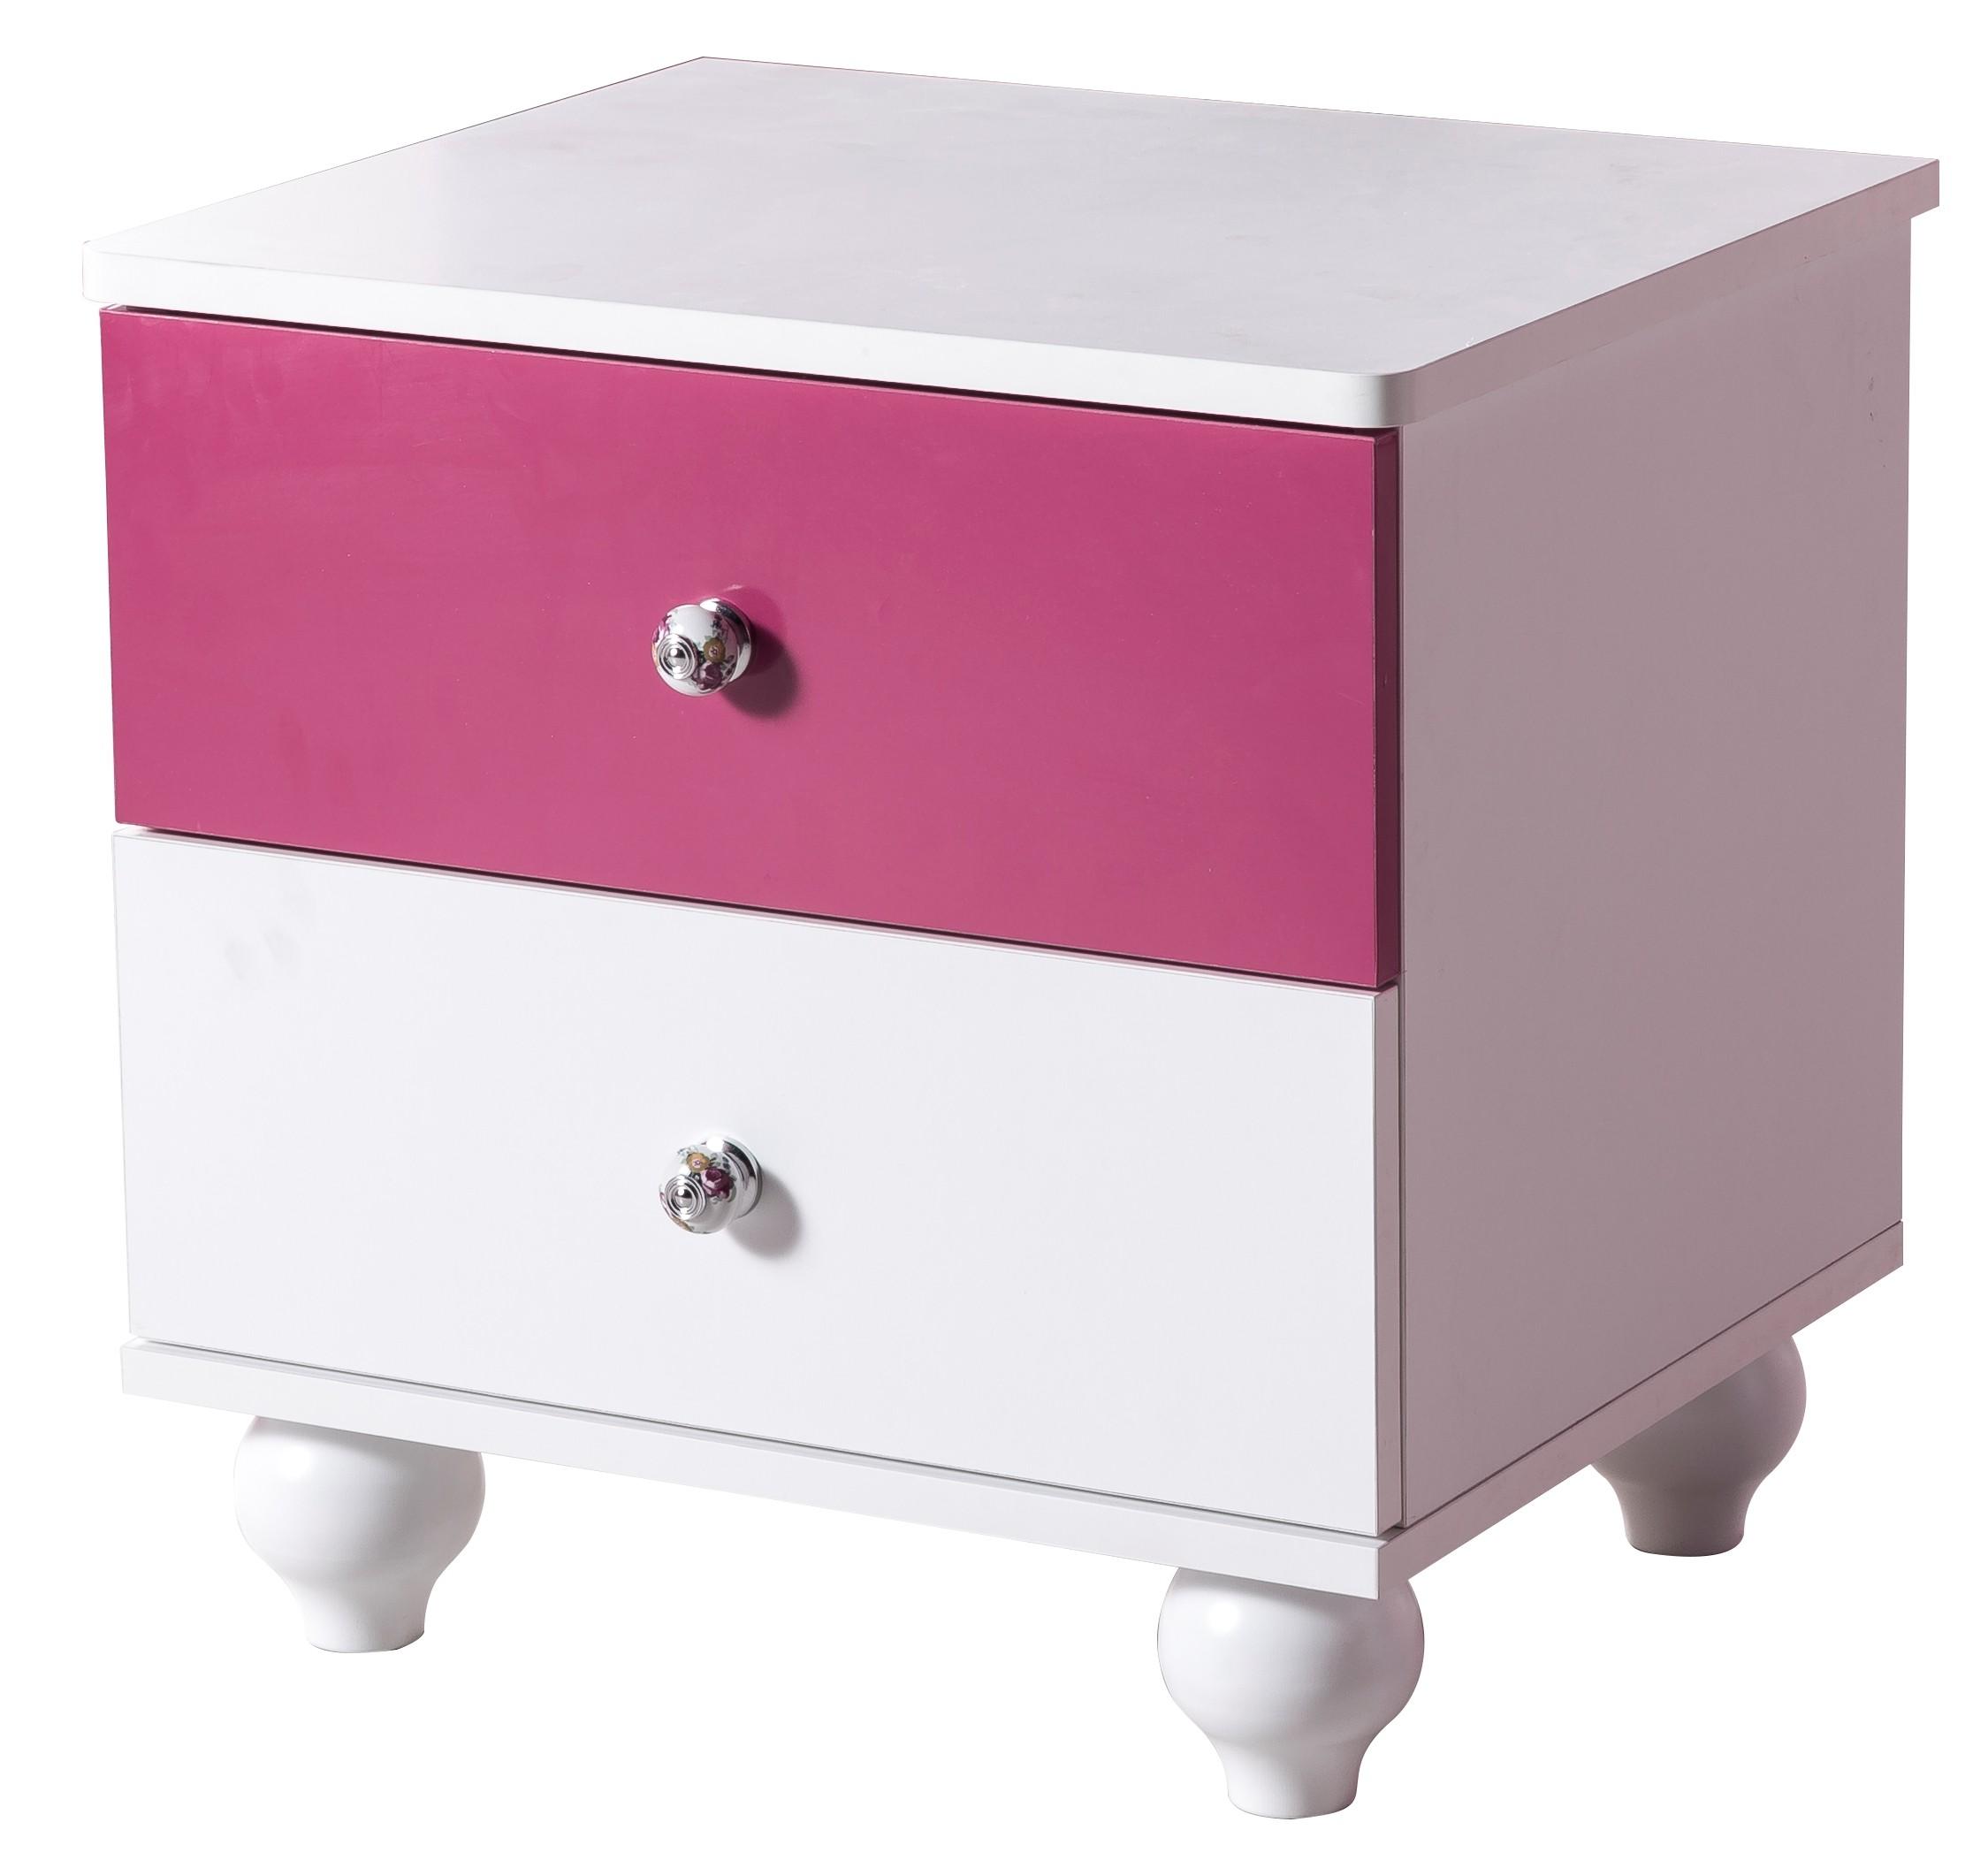 table de chevet fille blanc et rose girla. Black Bedroom Furniture Sets. Home Design Ideas